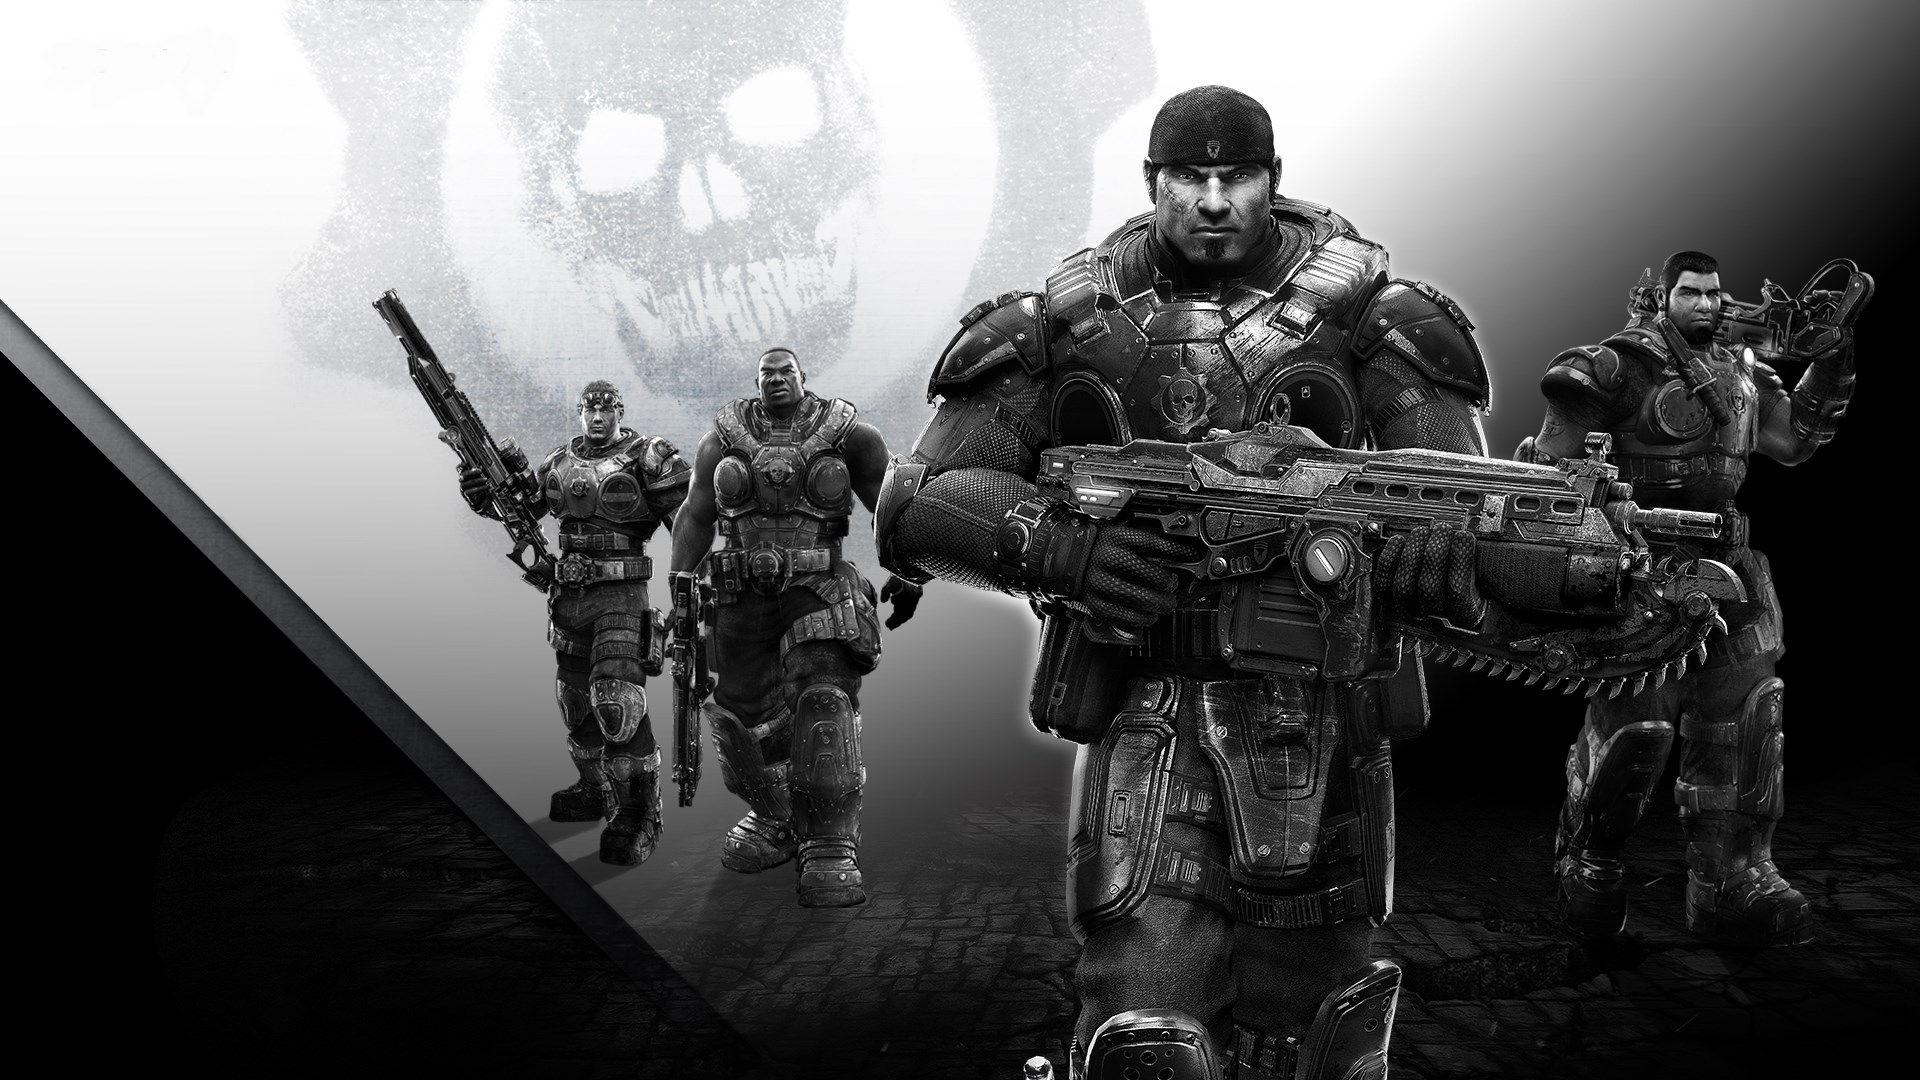 Buy Gears of War Ultimate Edition Deluxe Version - Microsoft Store en-CA